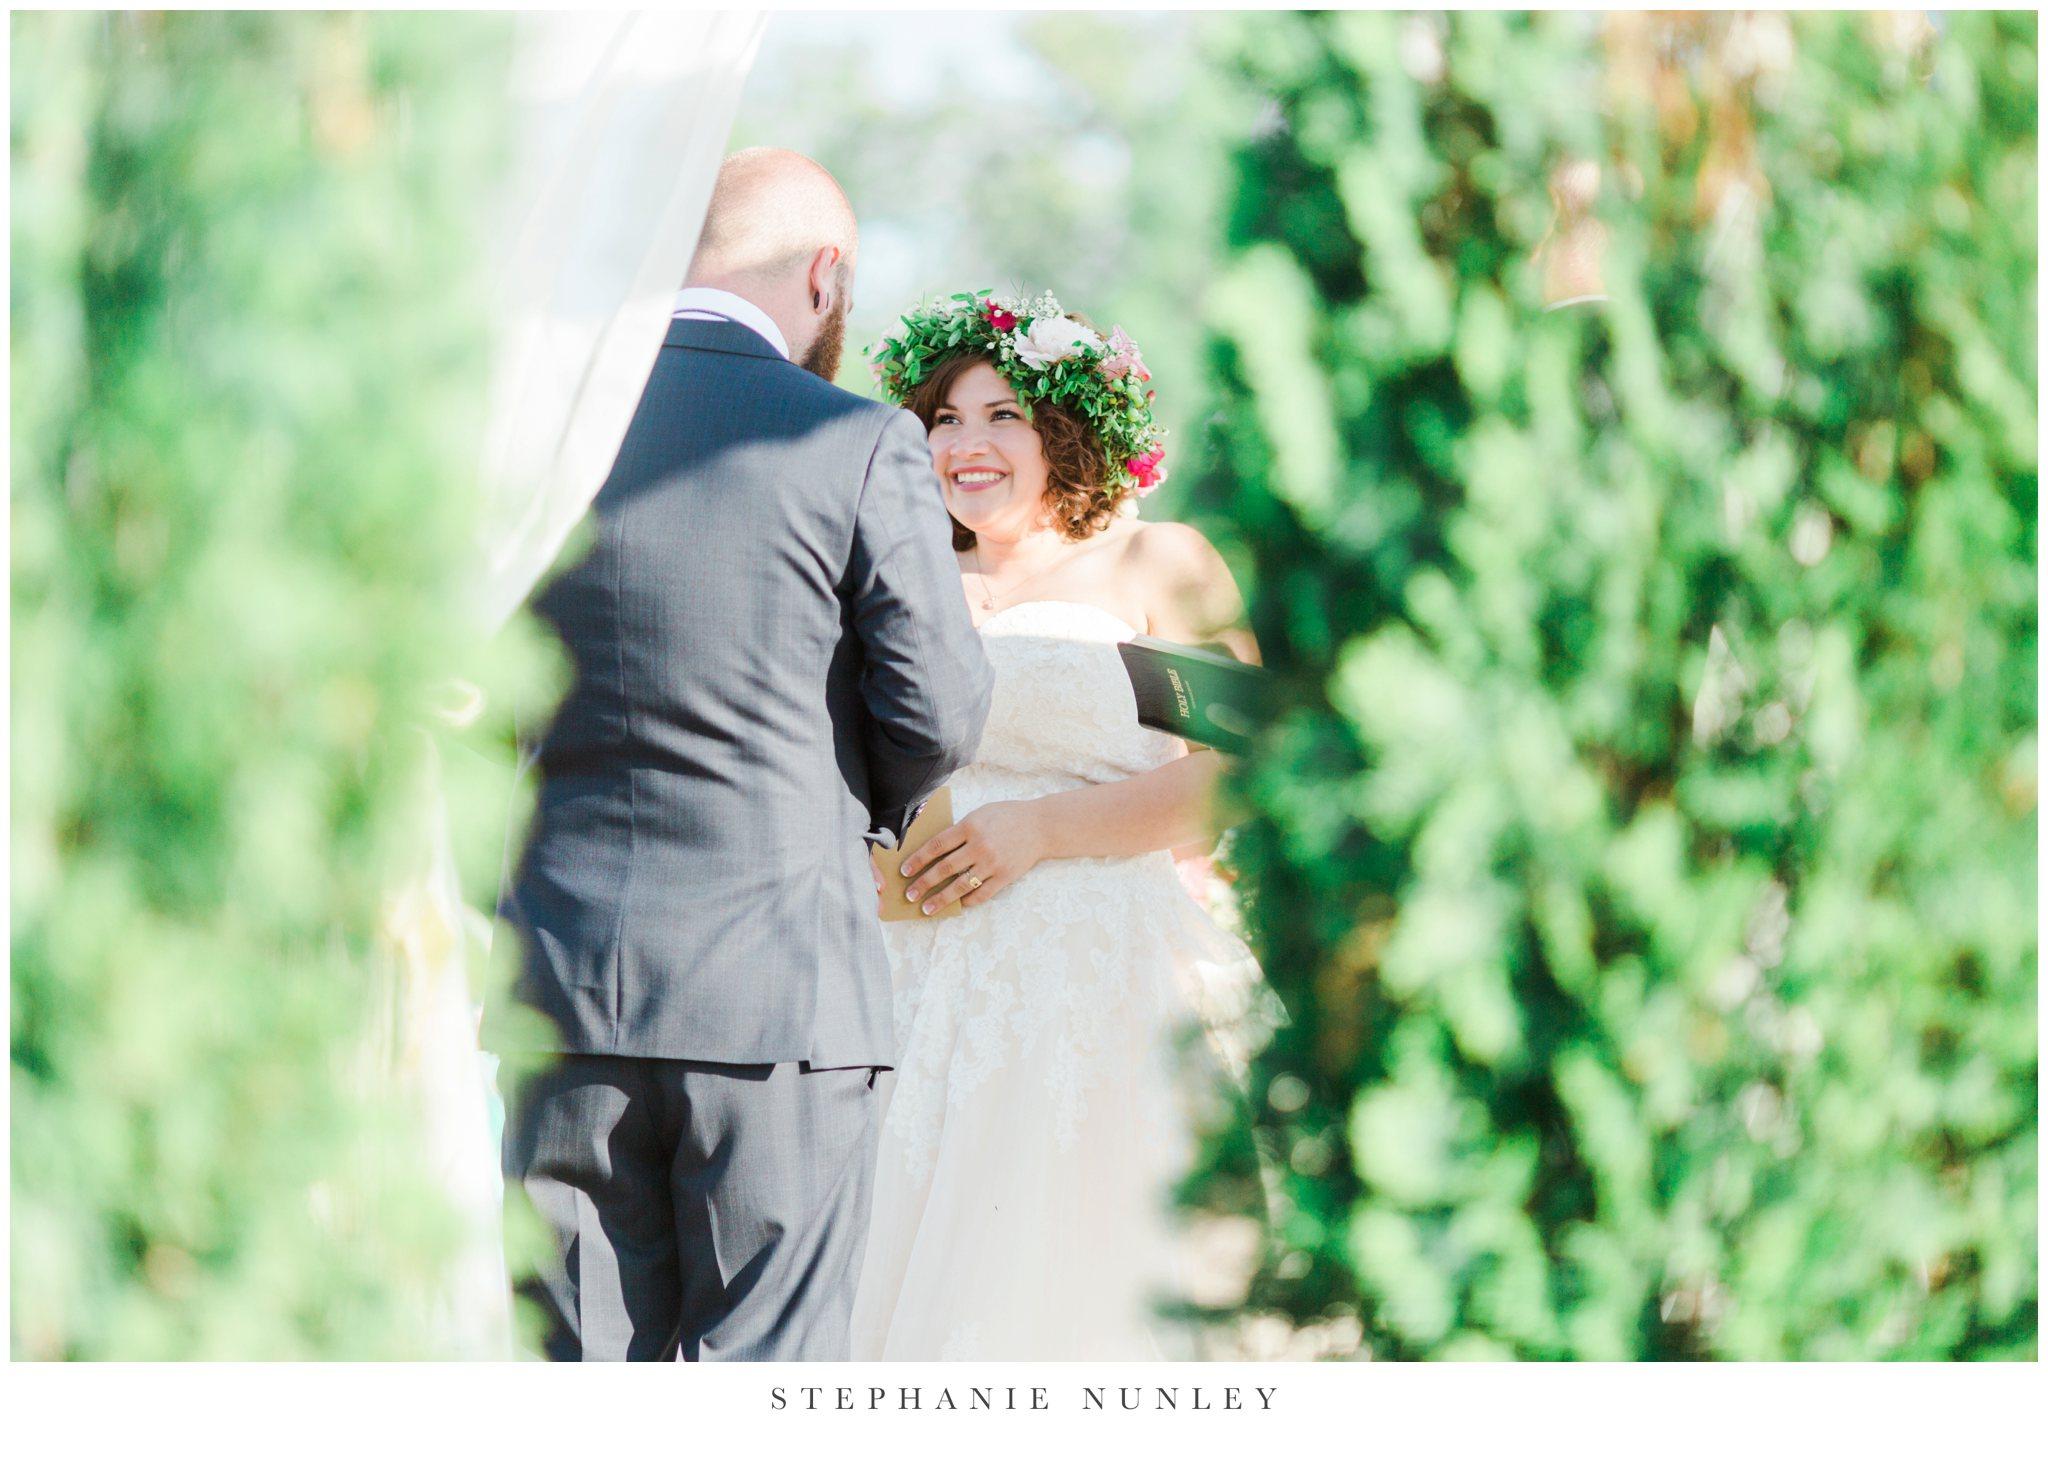 romantic-outdoor-wedding-with-flower-crown-0096.jpg